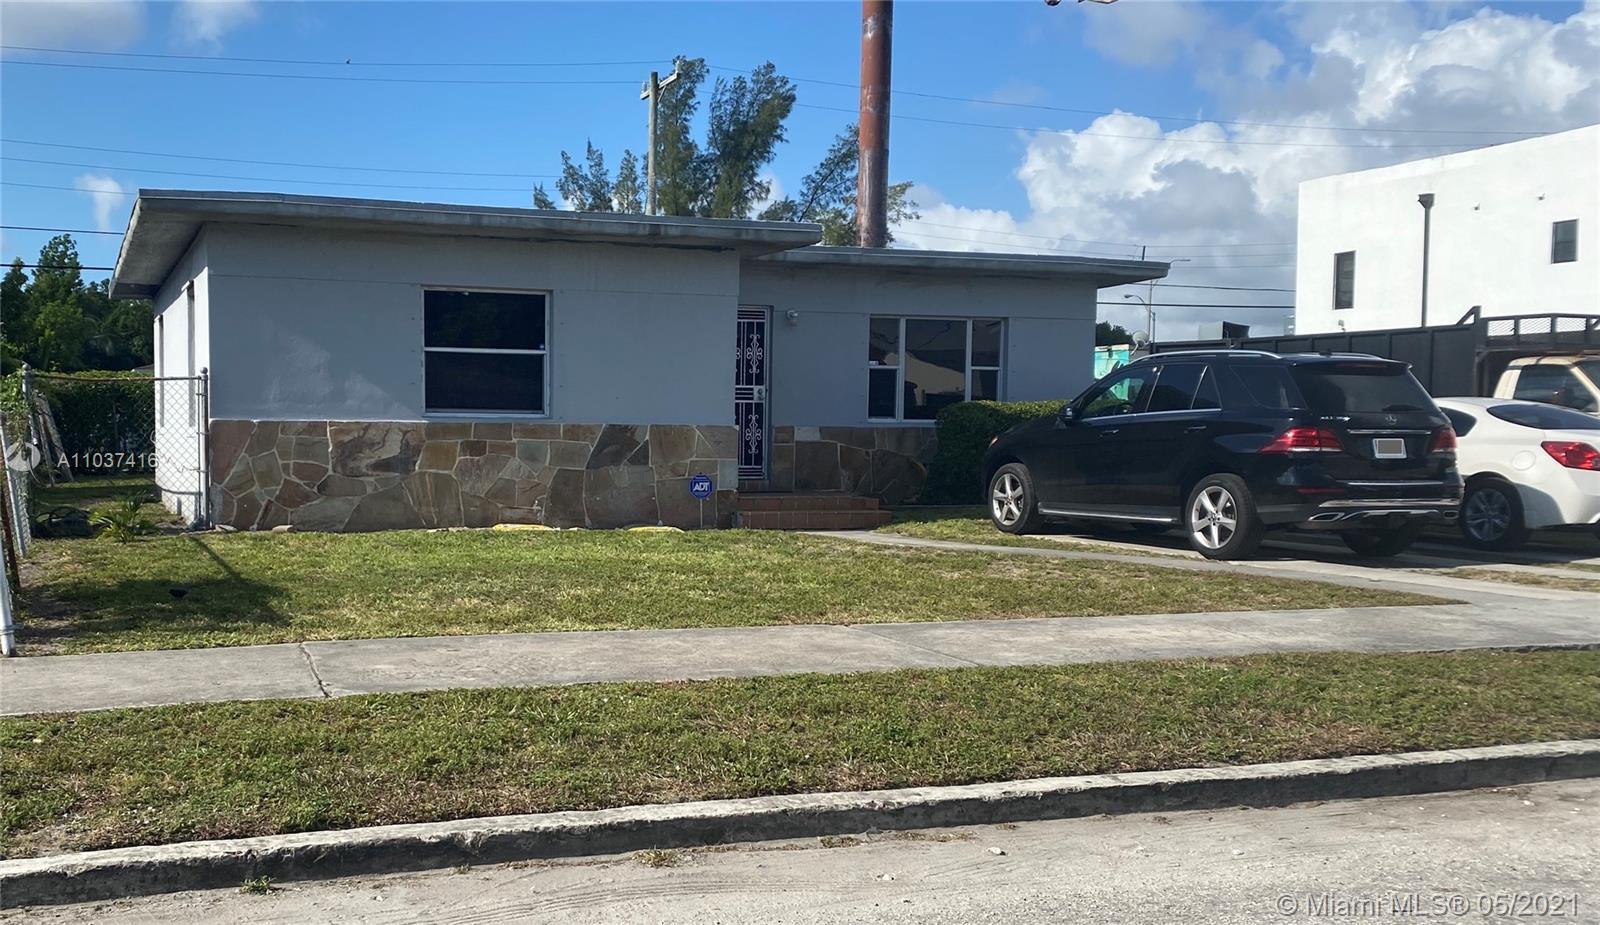 Bay Vista Park - 660 NW 47th St, Miami, FL 33127